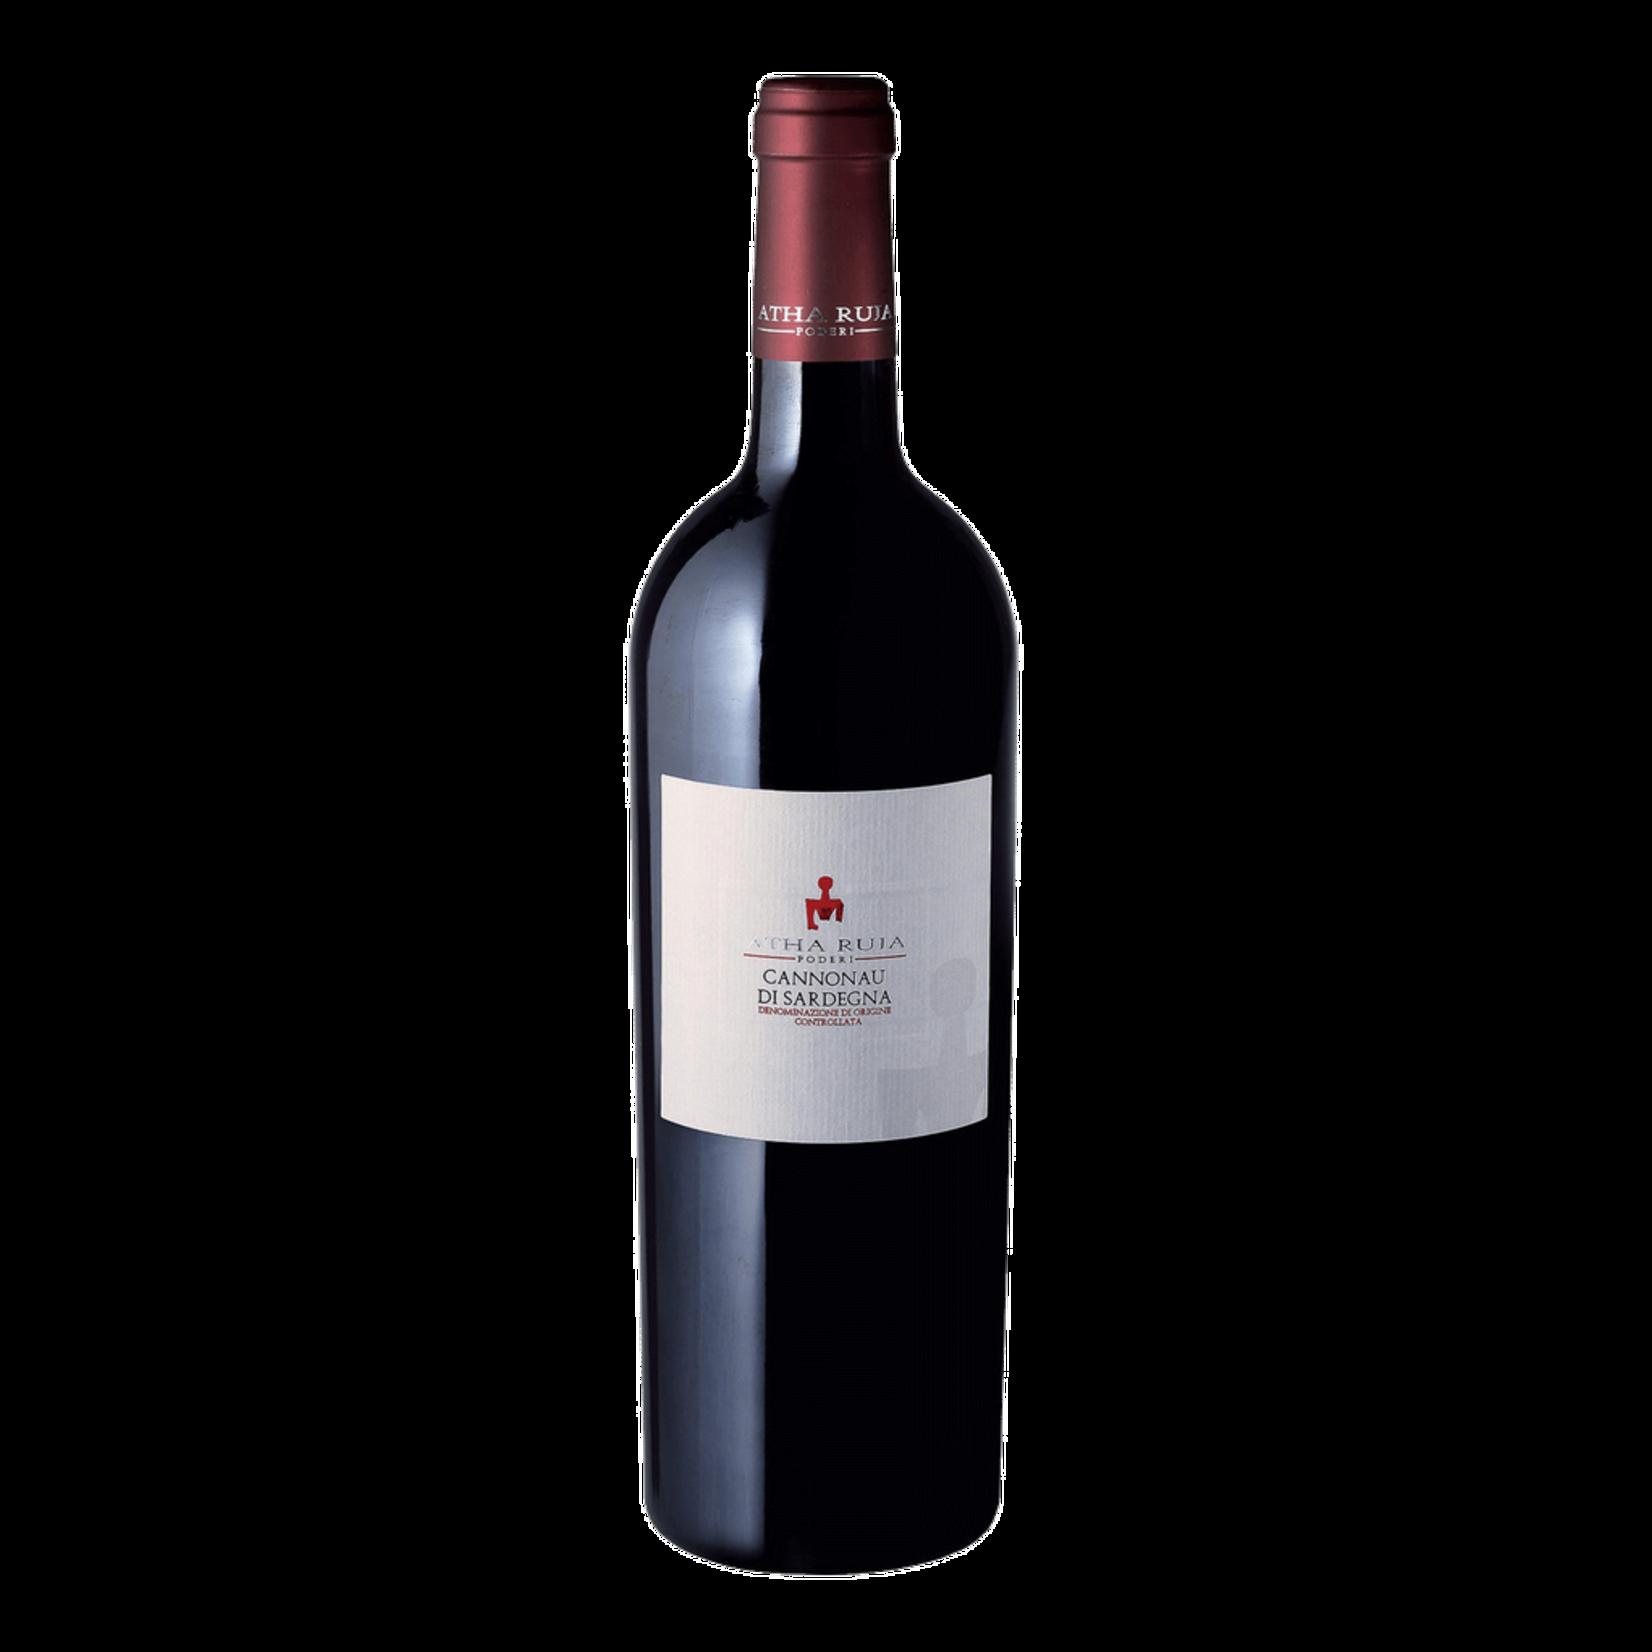 Wine Atha Ruja Cannonau di Sardegna